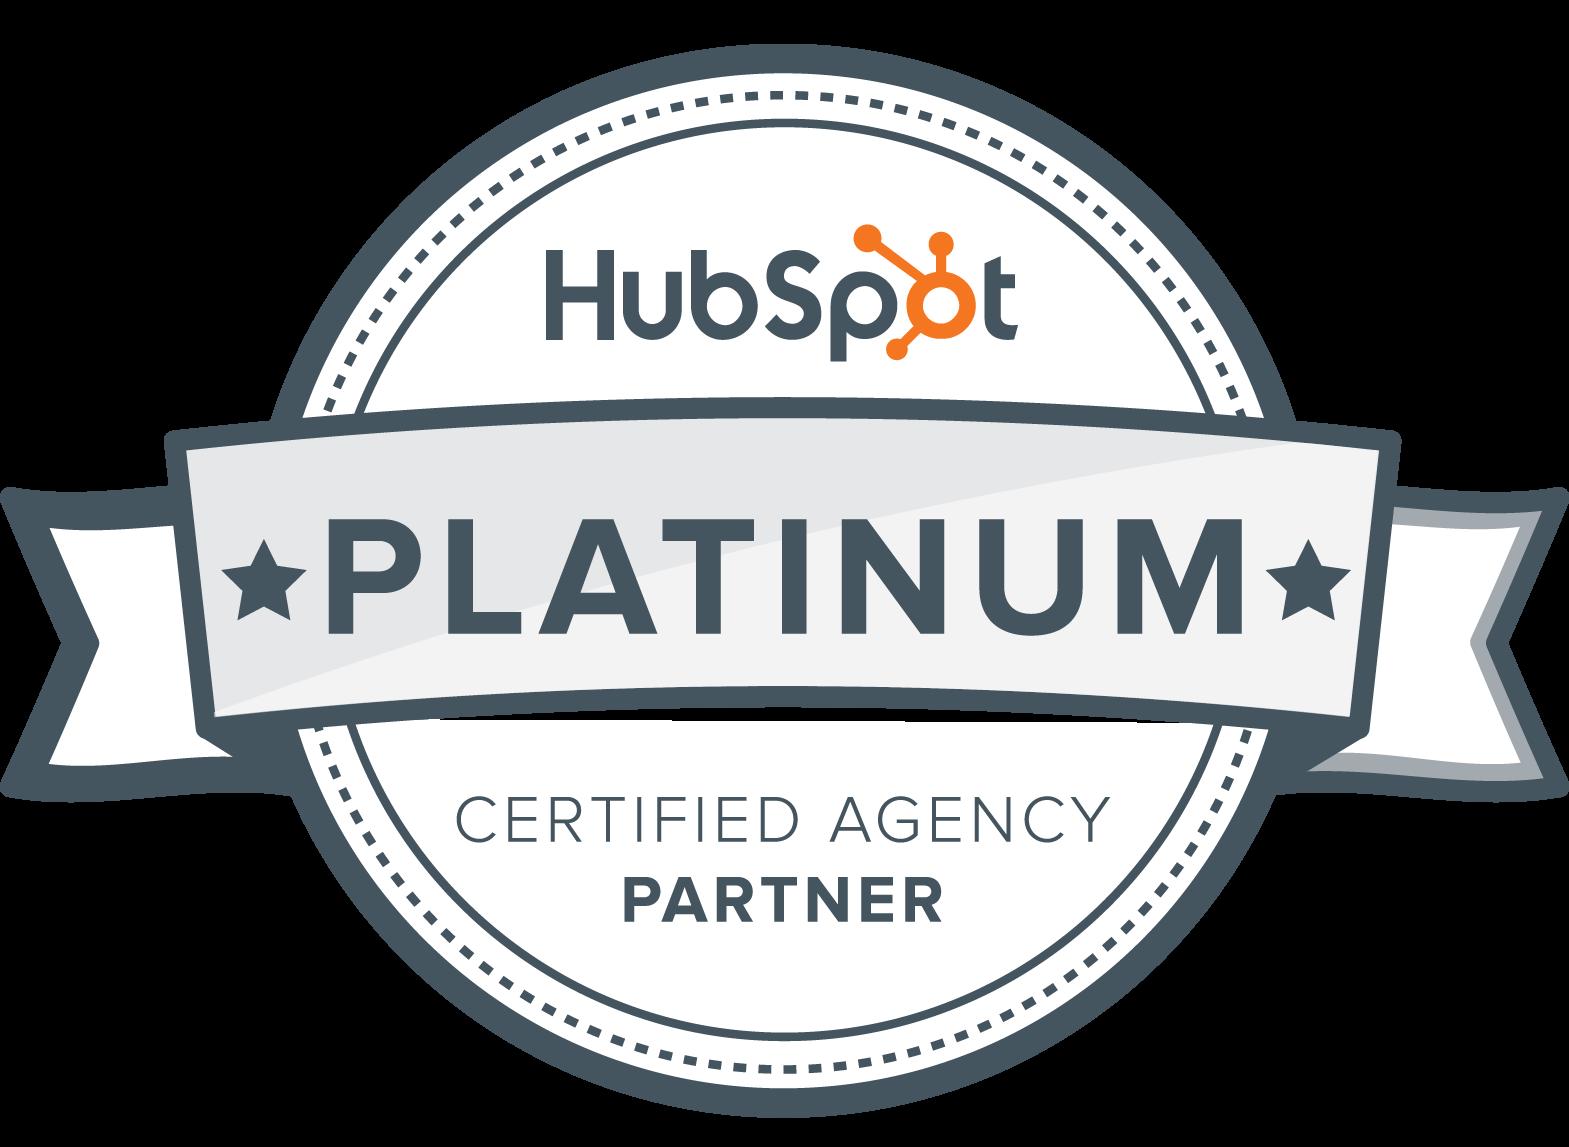 HubSpot-Platinum-Tier-Badge.png